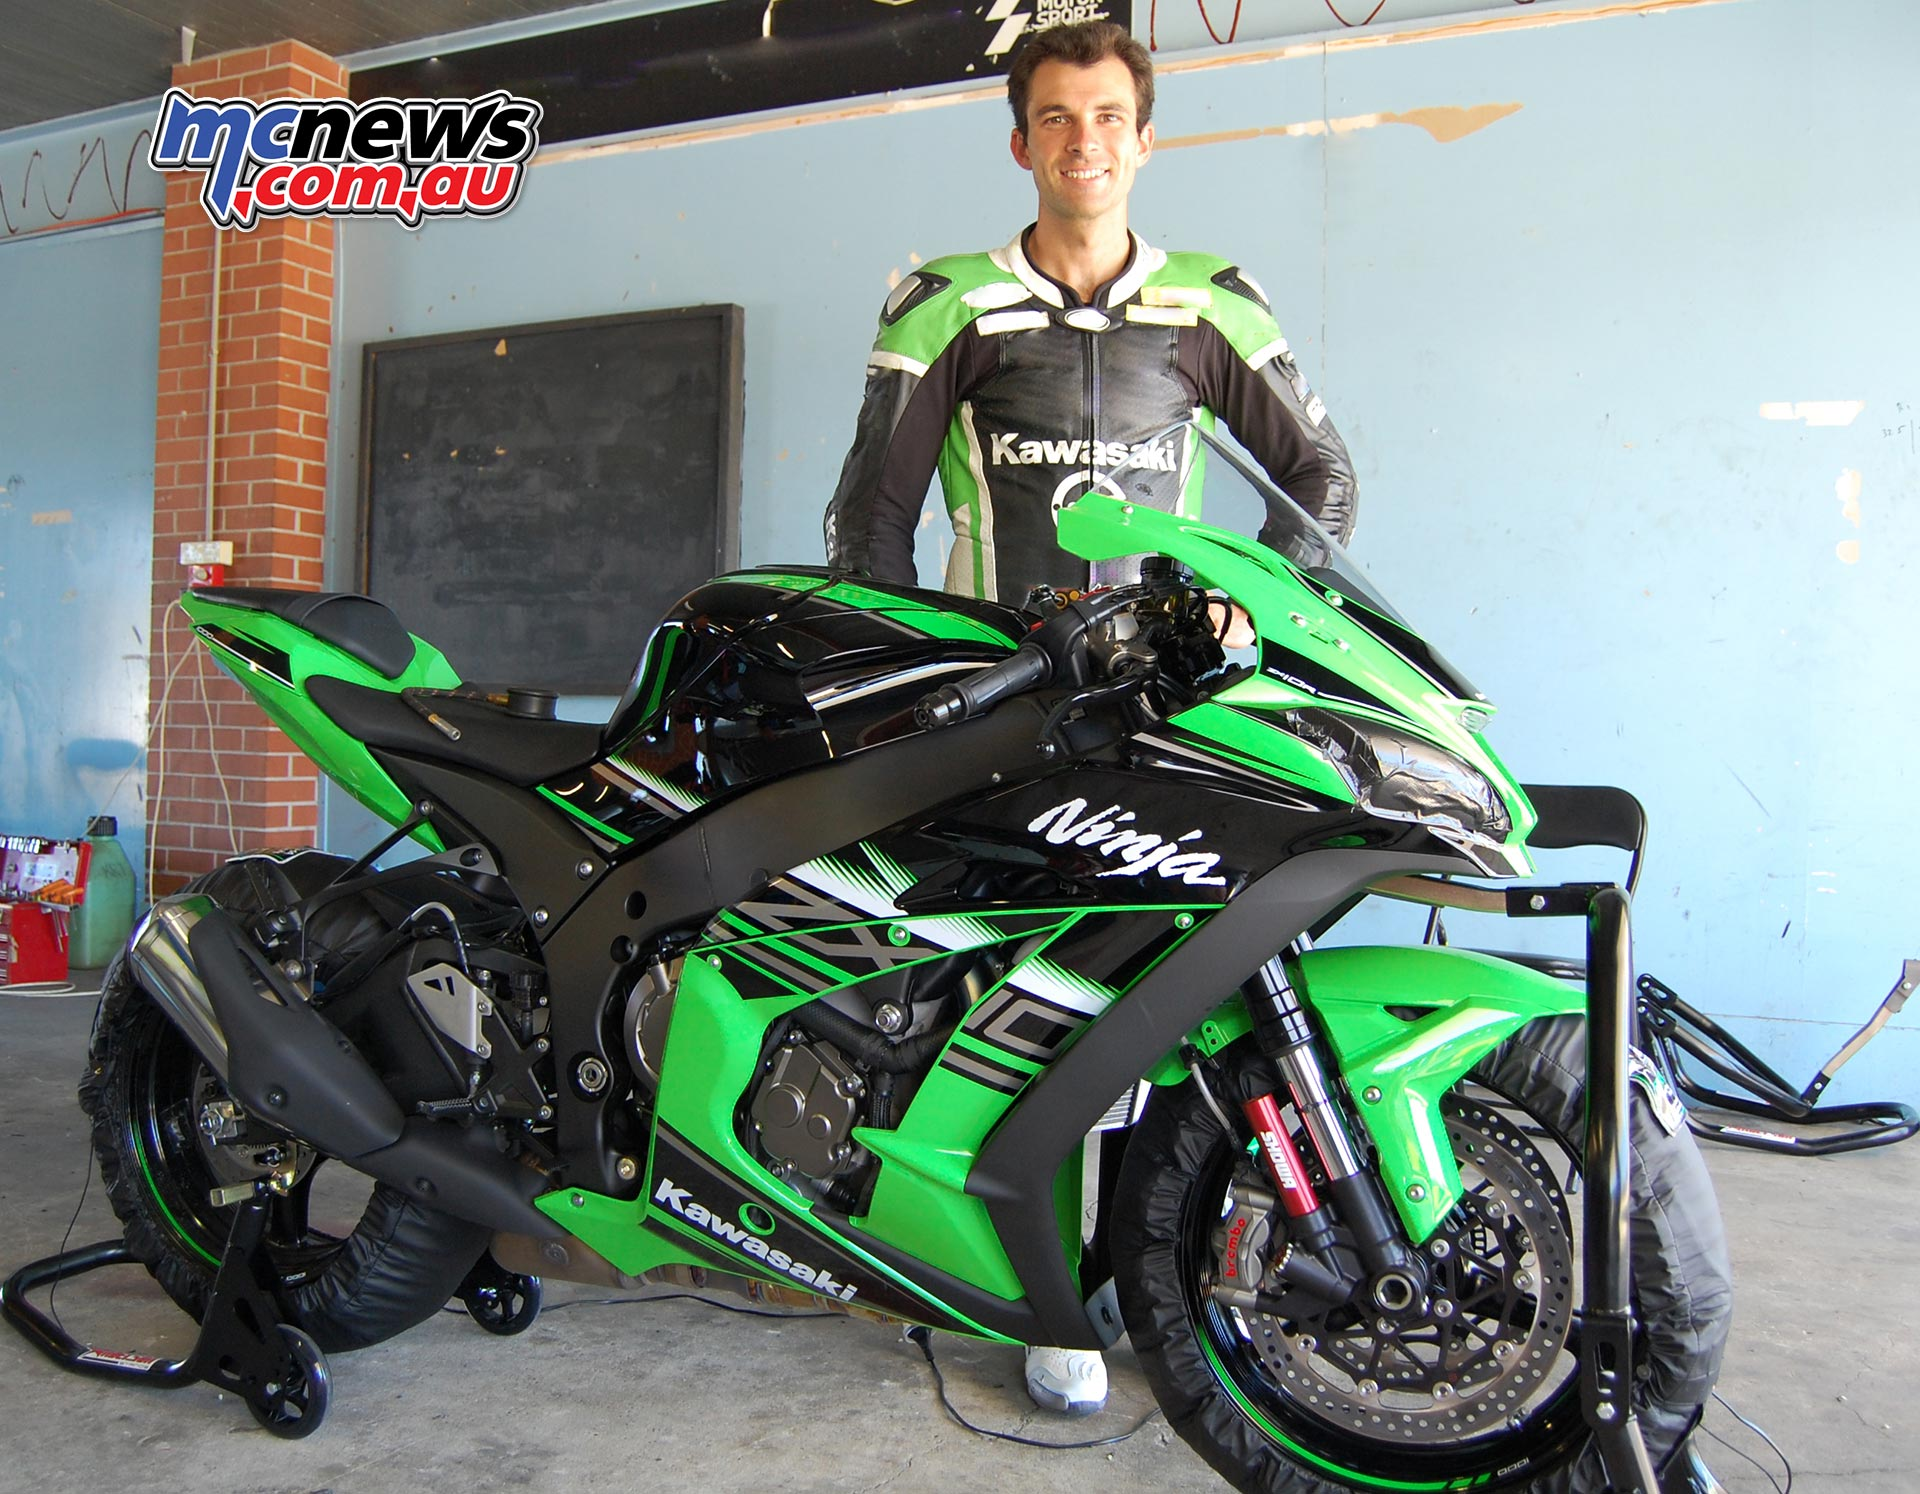 Bryan Staring will contend aboard his Kawasaki Motors Australia backed Ninja ZX-10R in the 2018 Australian Superbike Championship under the Kawasaki BCperformance Racing Team banner.